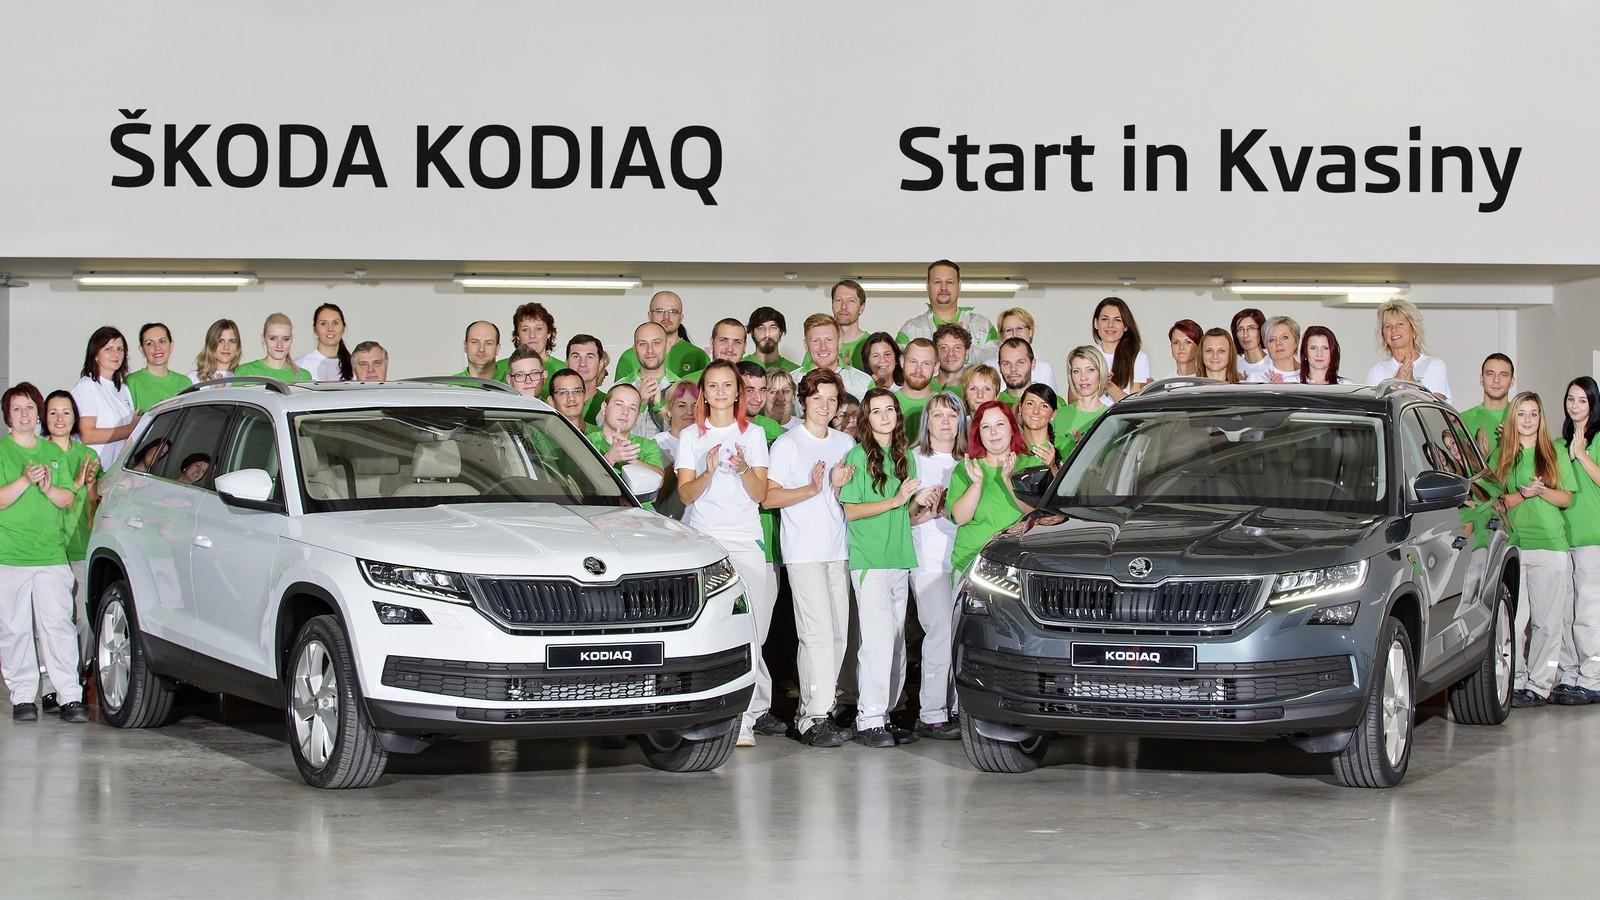 ВЧехии стартовало производство Шкода Kodiaq